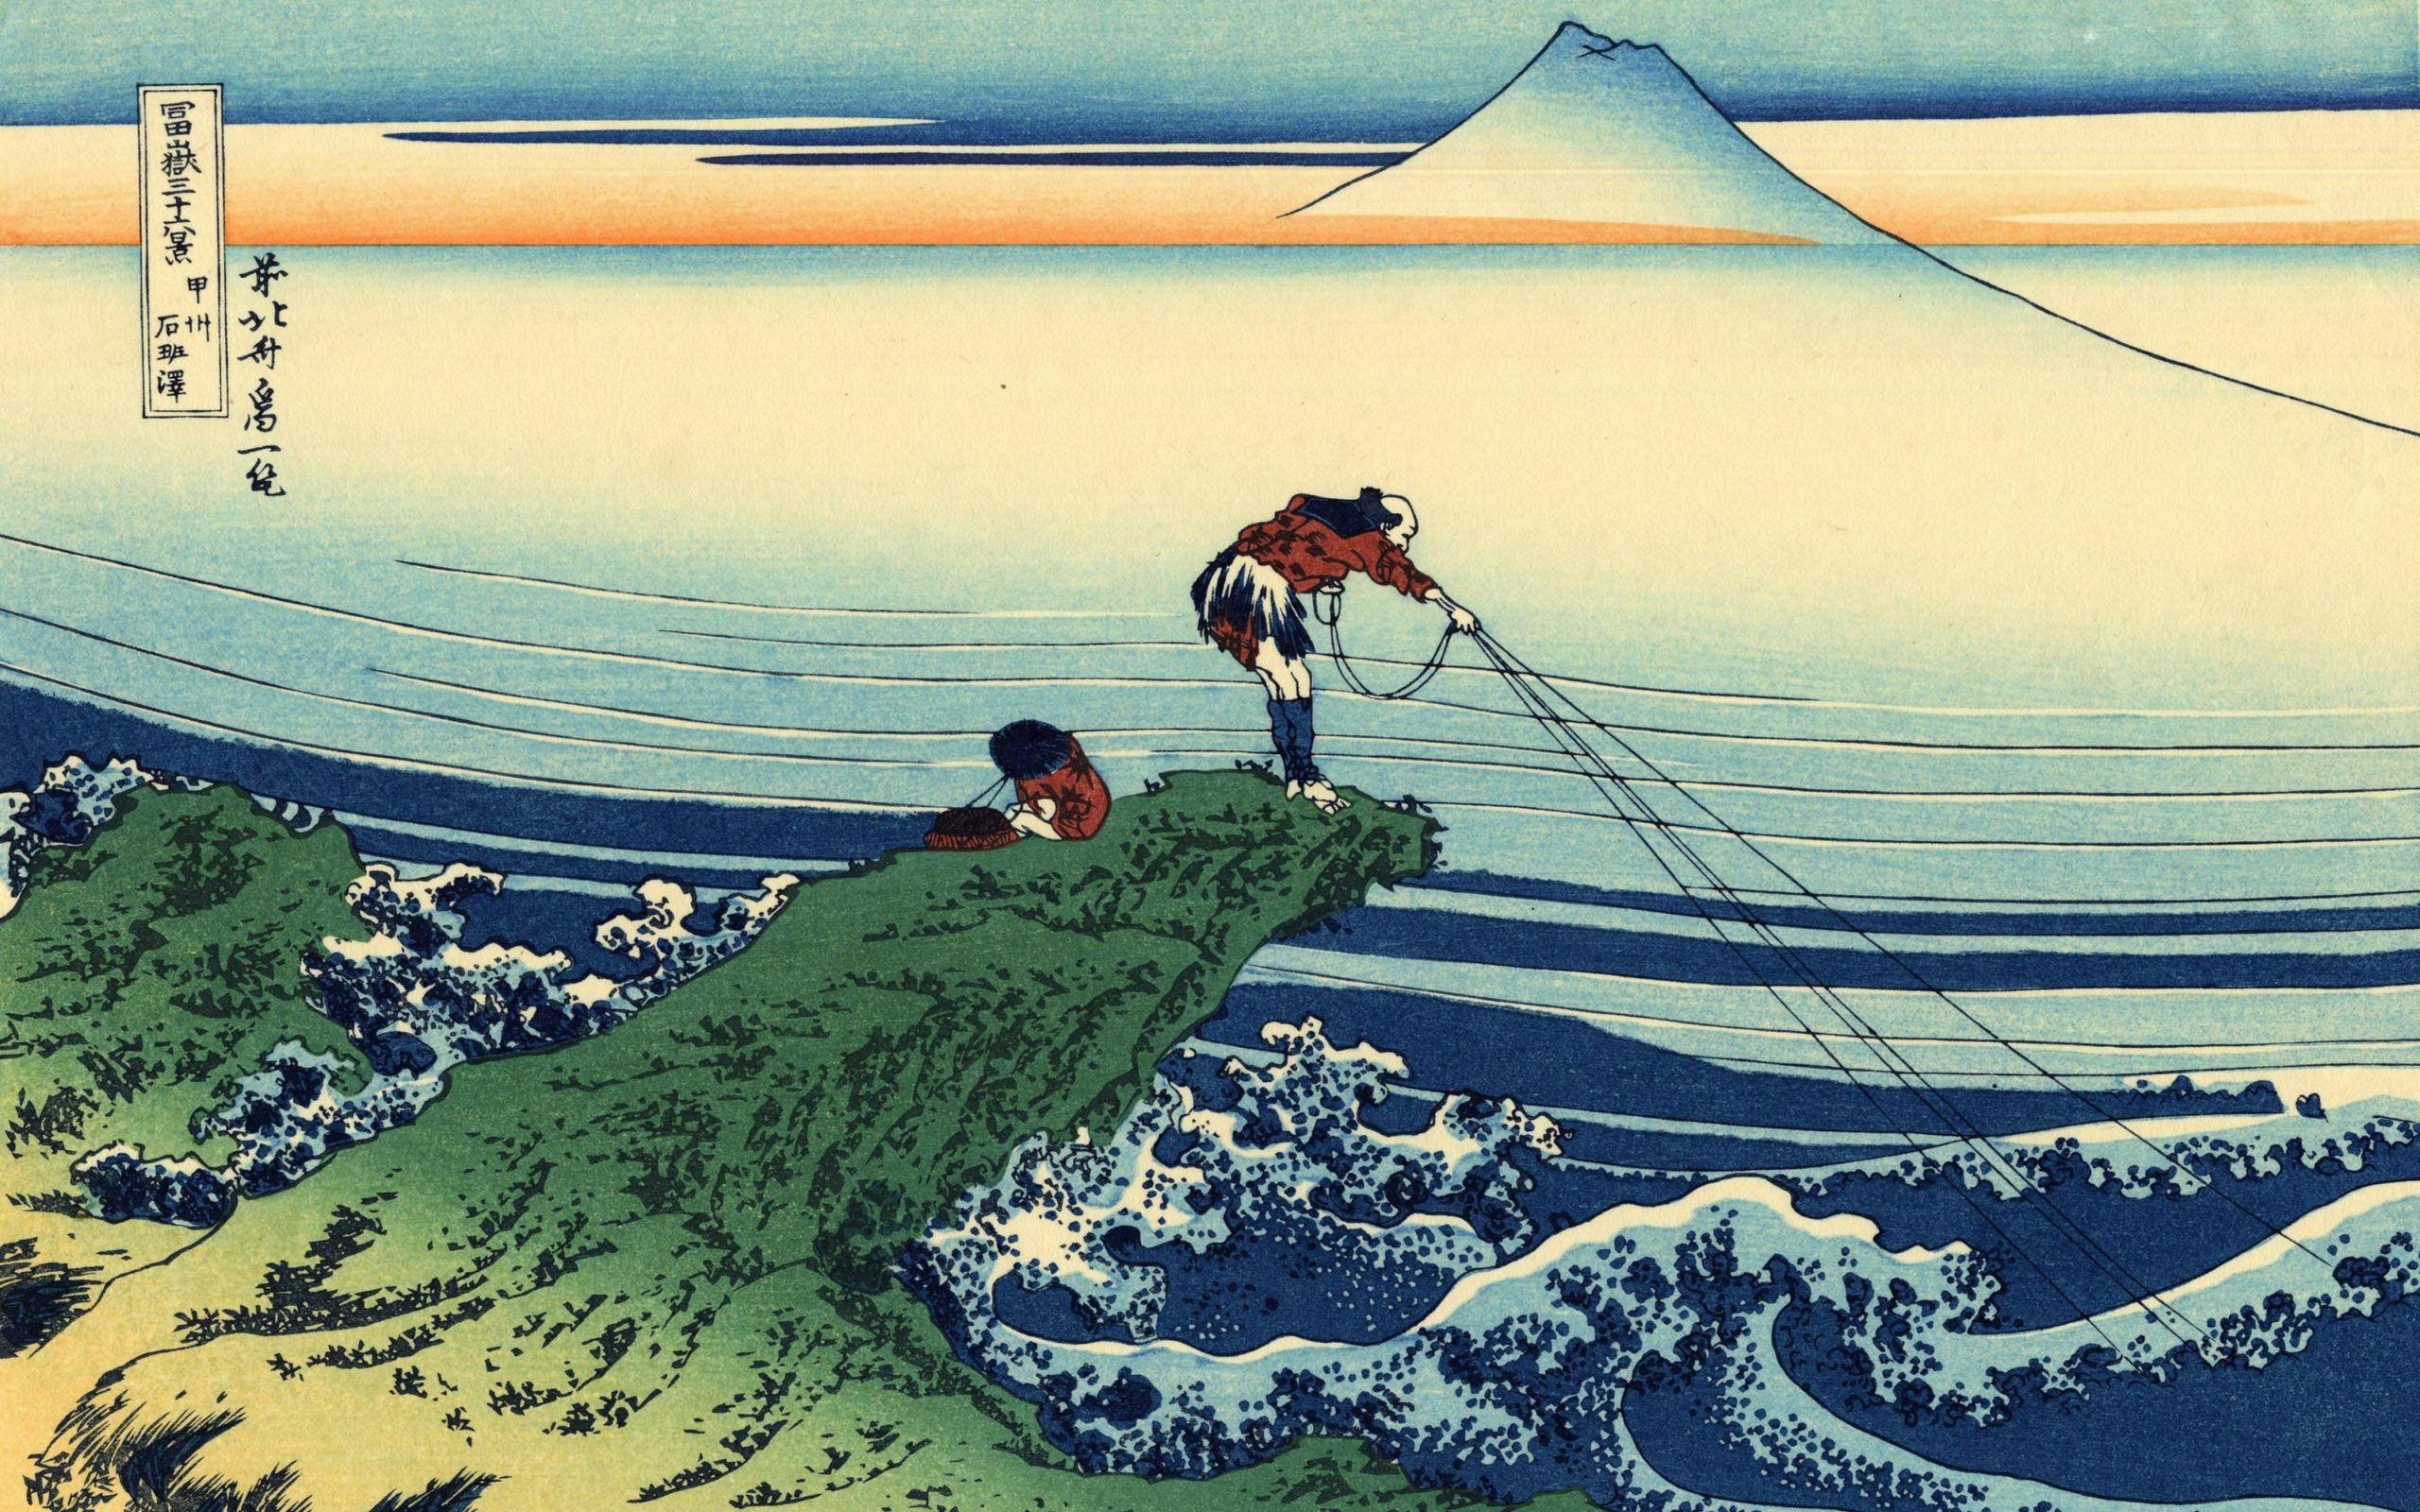 Katsushika Hokusai Thirtysix Views Of Mount Fuji Wallpaper - Thirty Six Views Of Mount Fuji , HD Wallpaper & Backgrounds